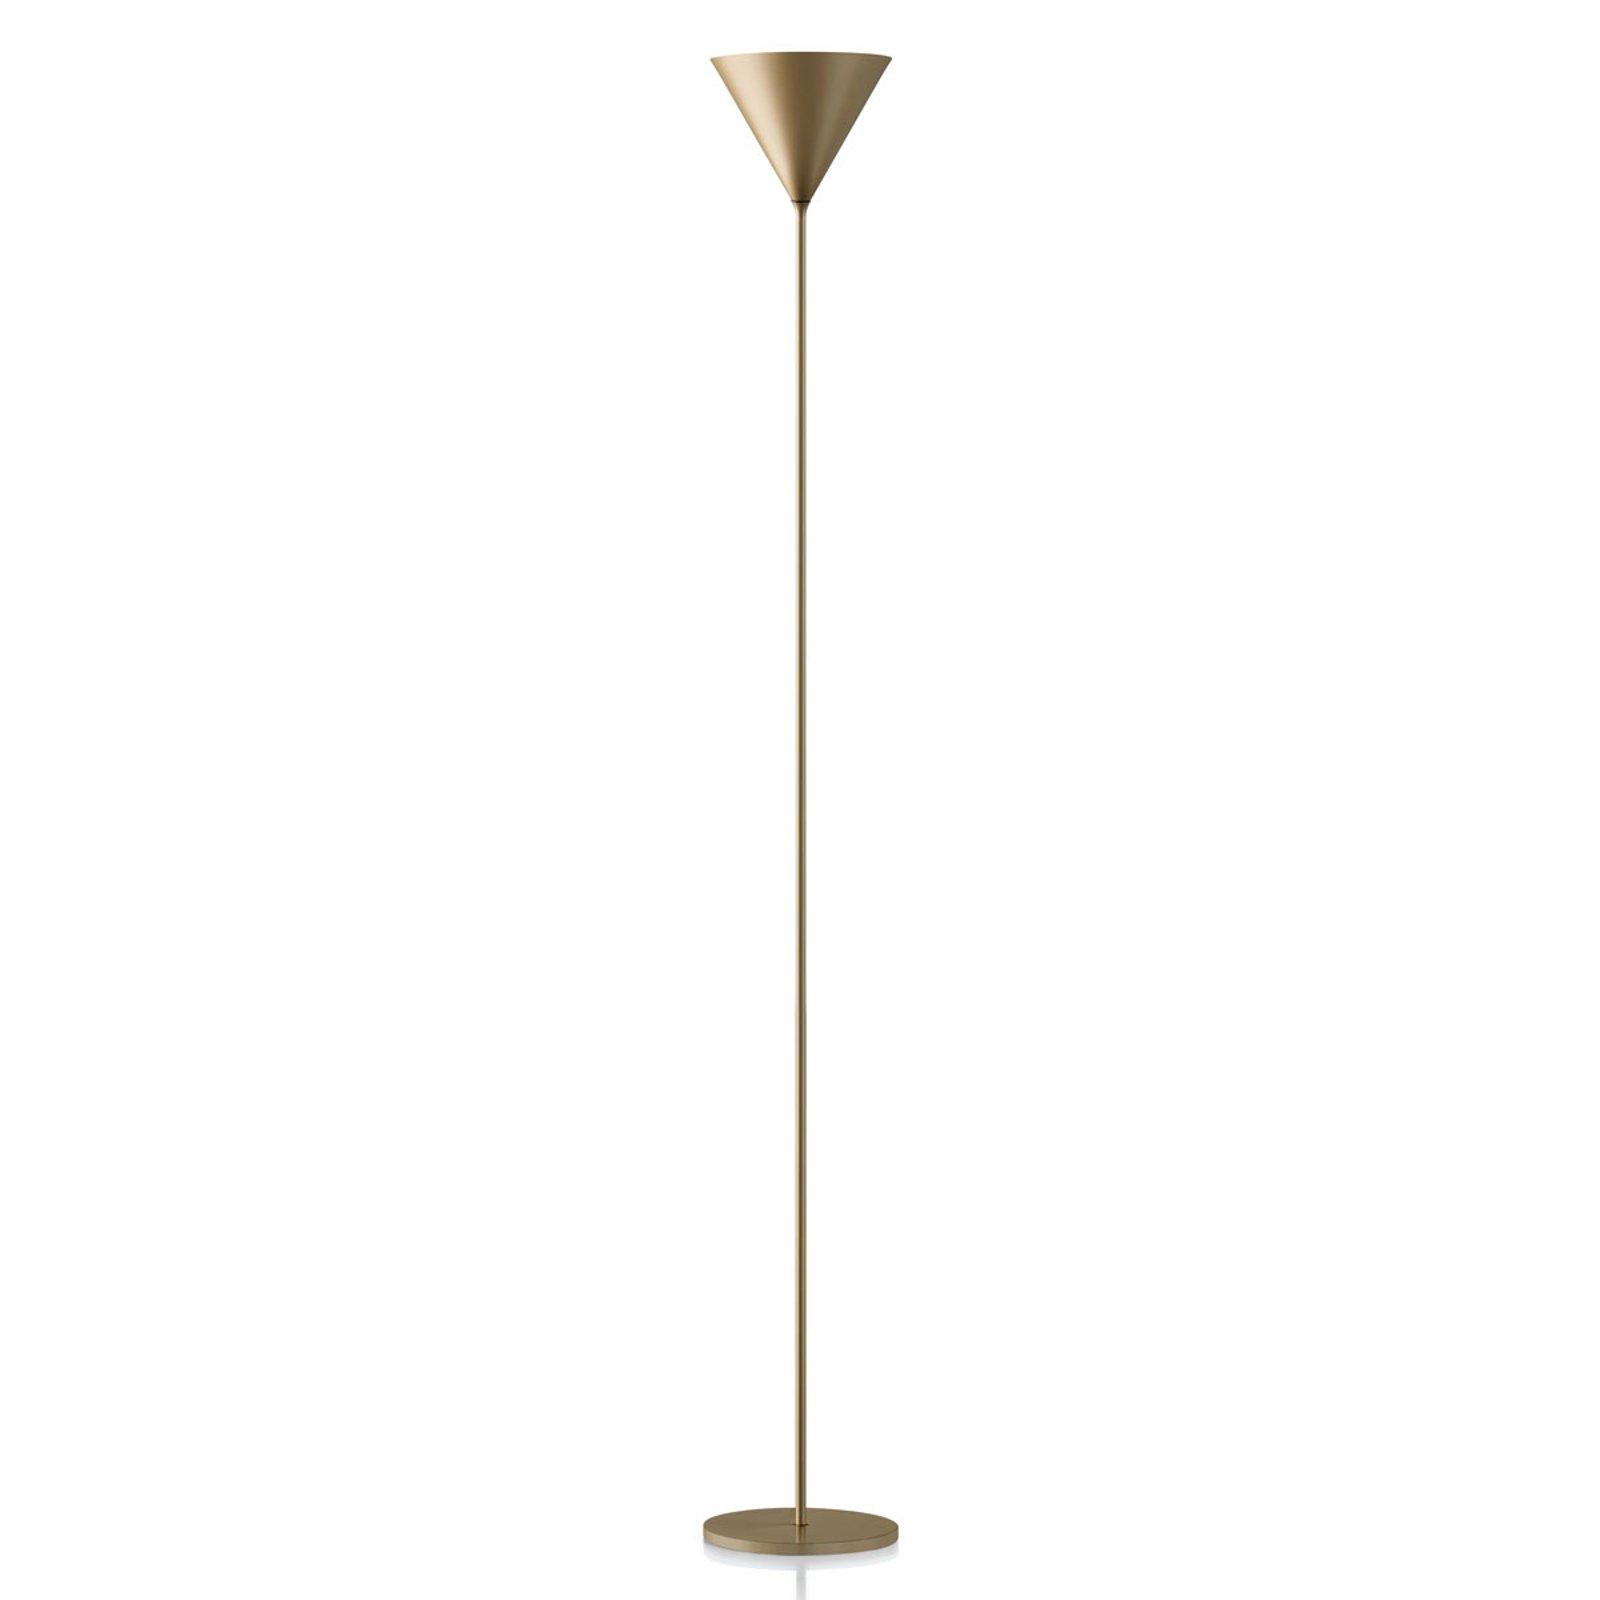 Modo Luce ABC Single gulvlampe matt gull